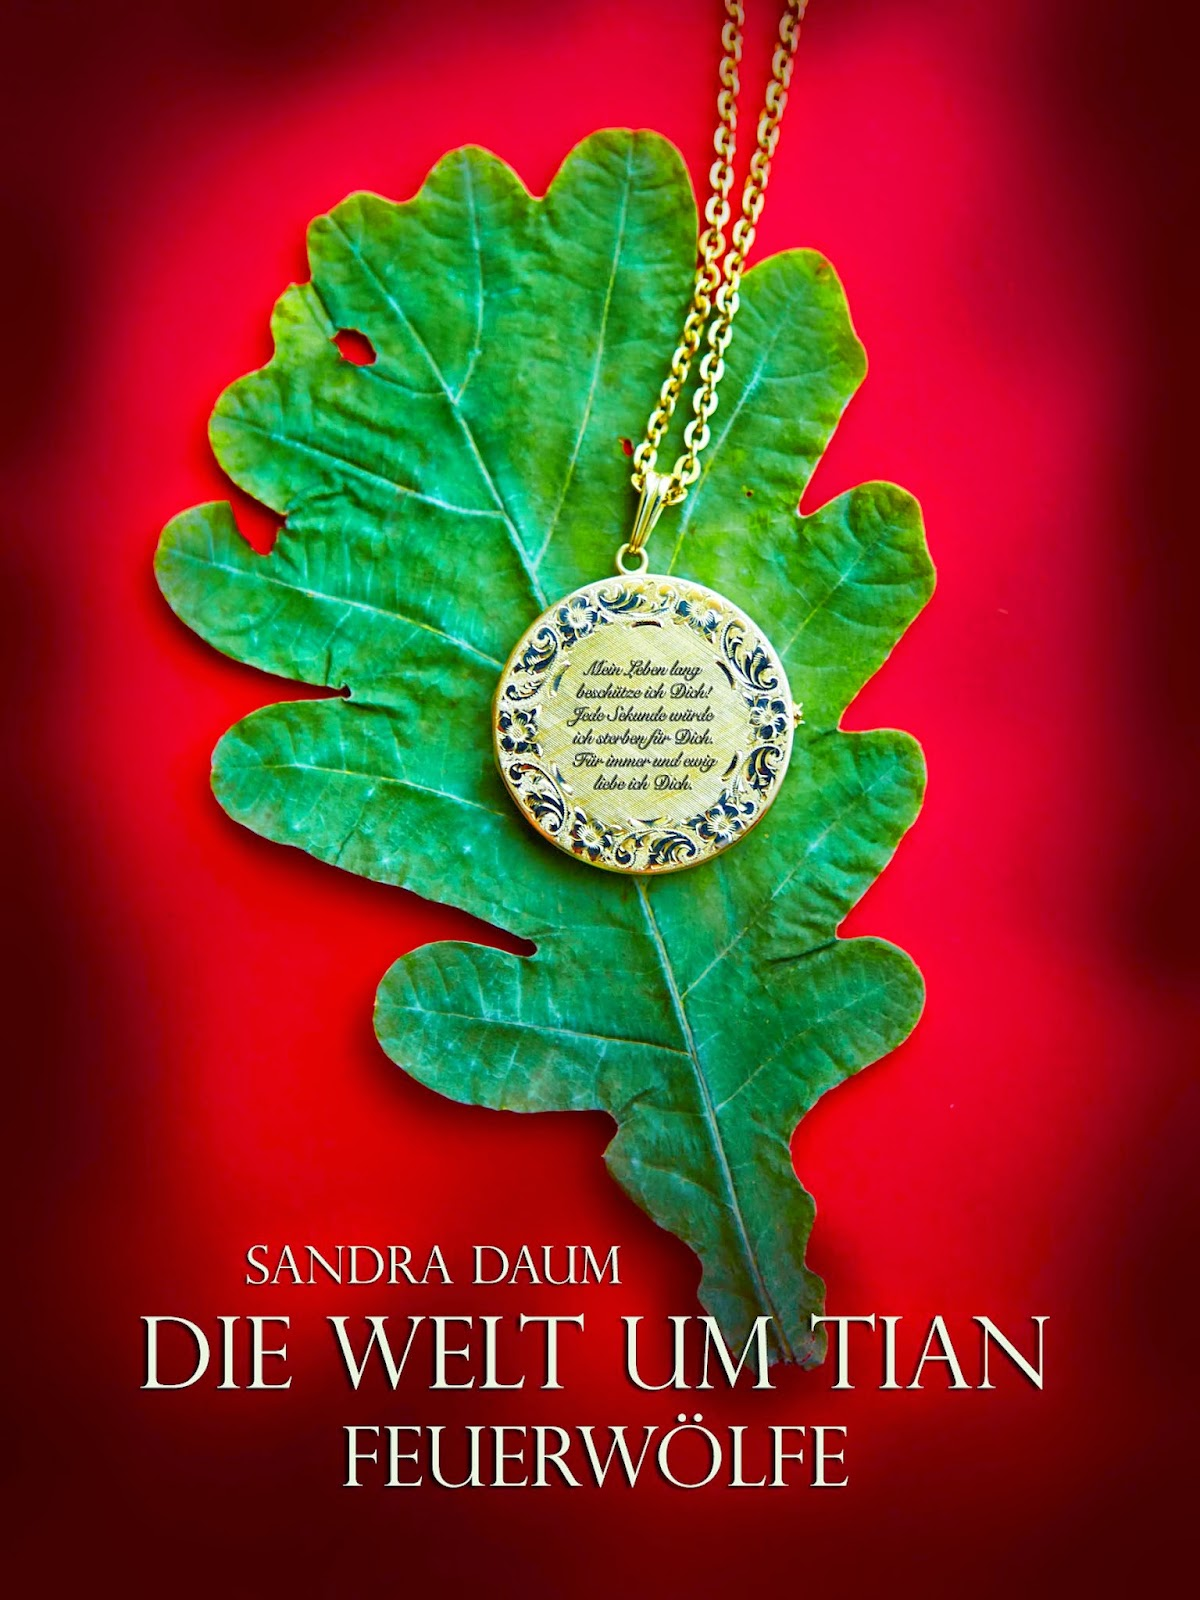 http://www.amazon.de/Die-Welt-um-Tian-Feuerw%C3%B6lfe-ebook/dp/B00PQPKNJ2/ref=sr_1_2?s=books&ie=UTF8&qid=1416304460&sr=1-2&keywords=sandra+daum